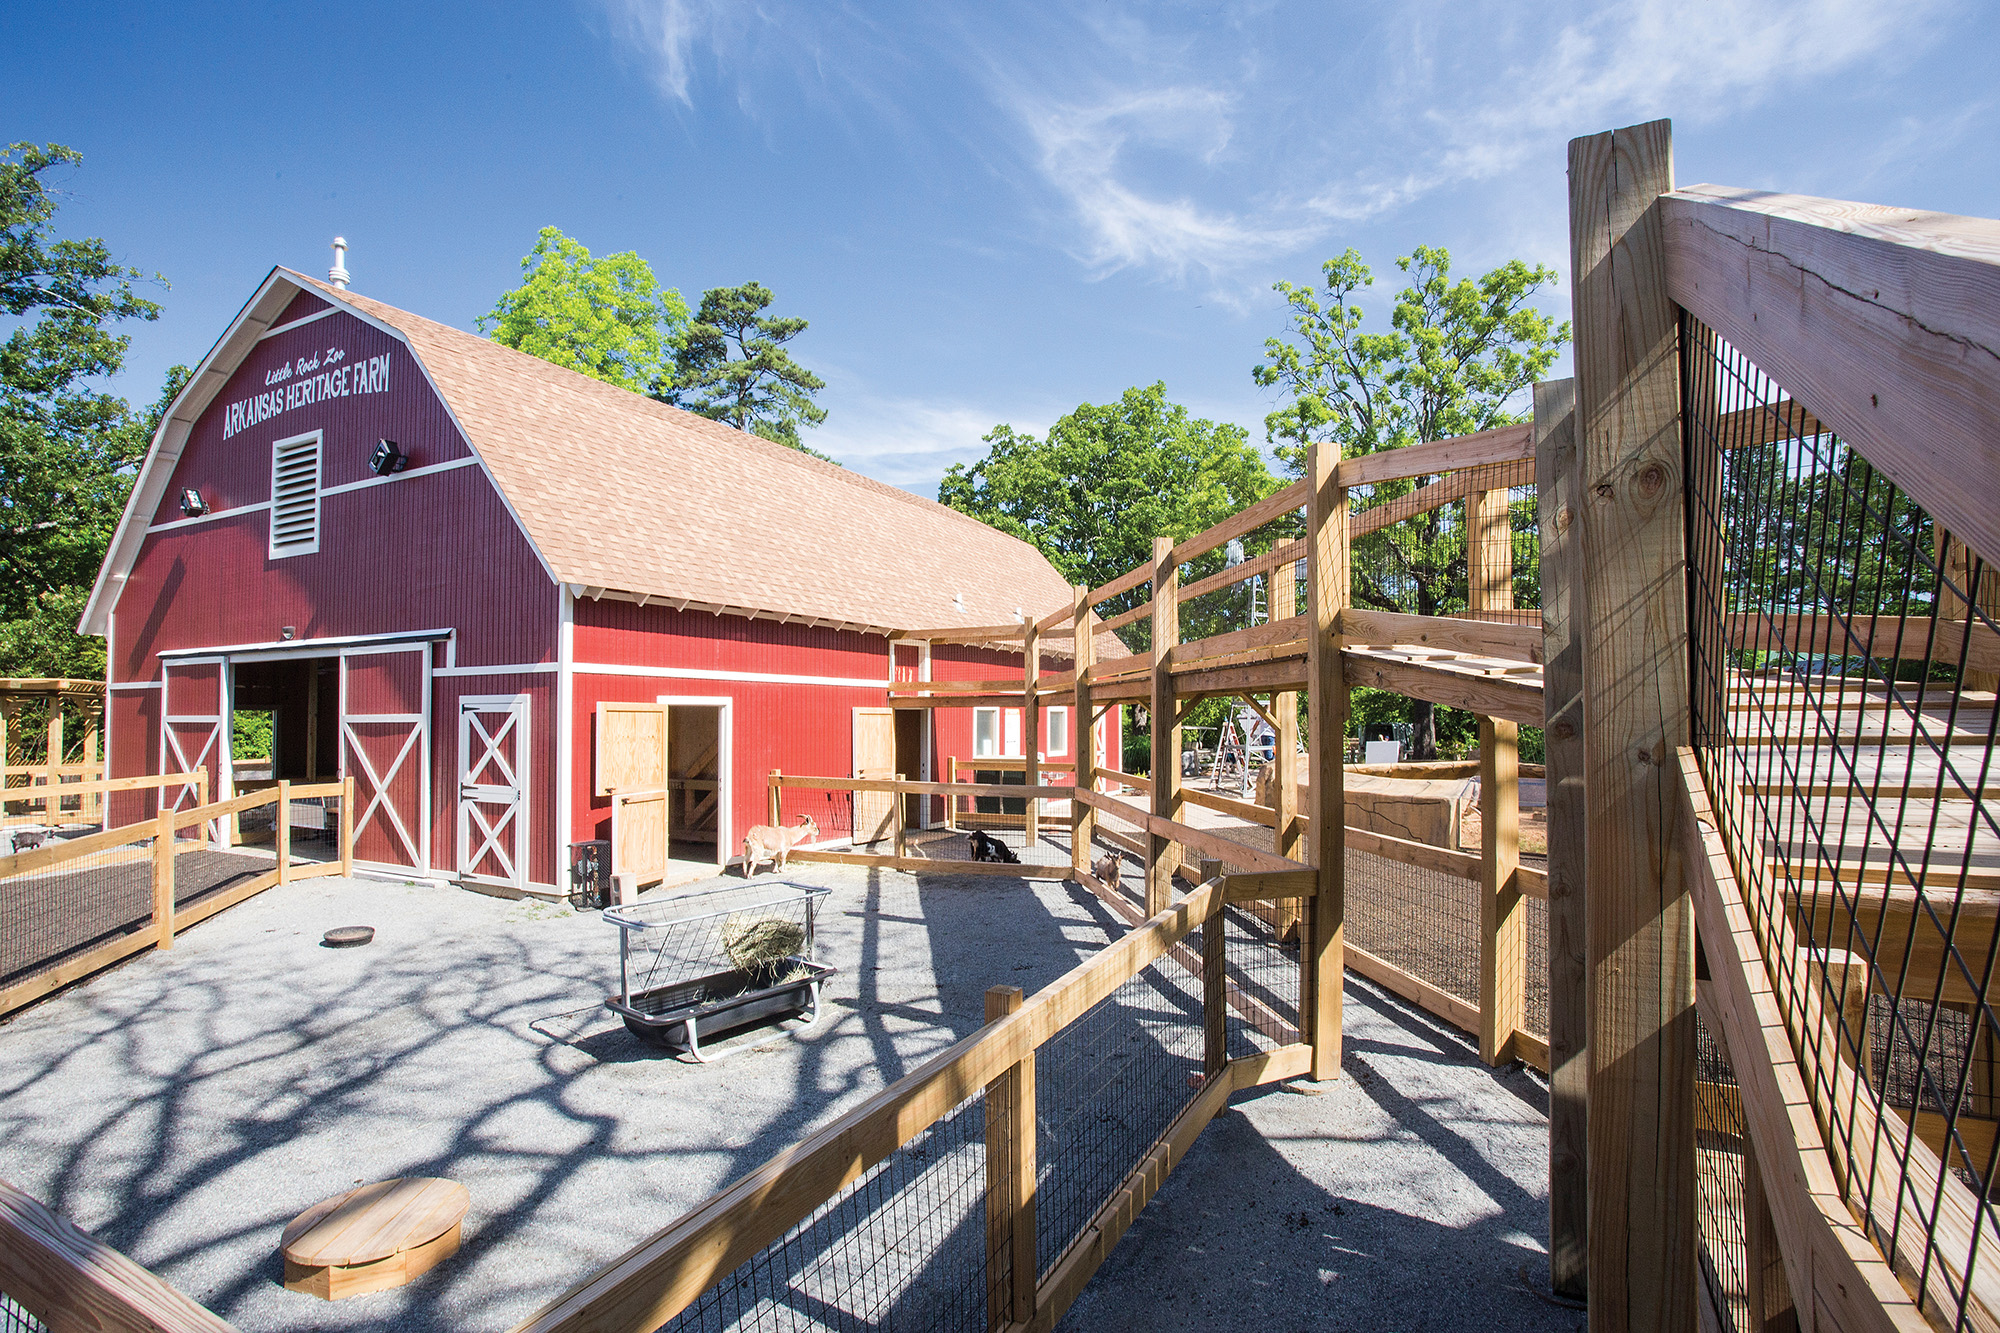 Arkansas Heritage Farm